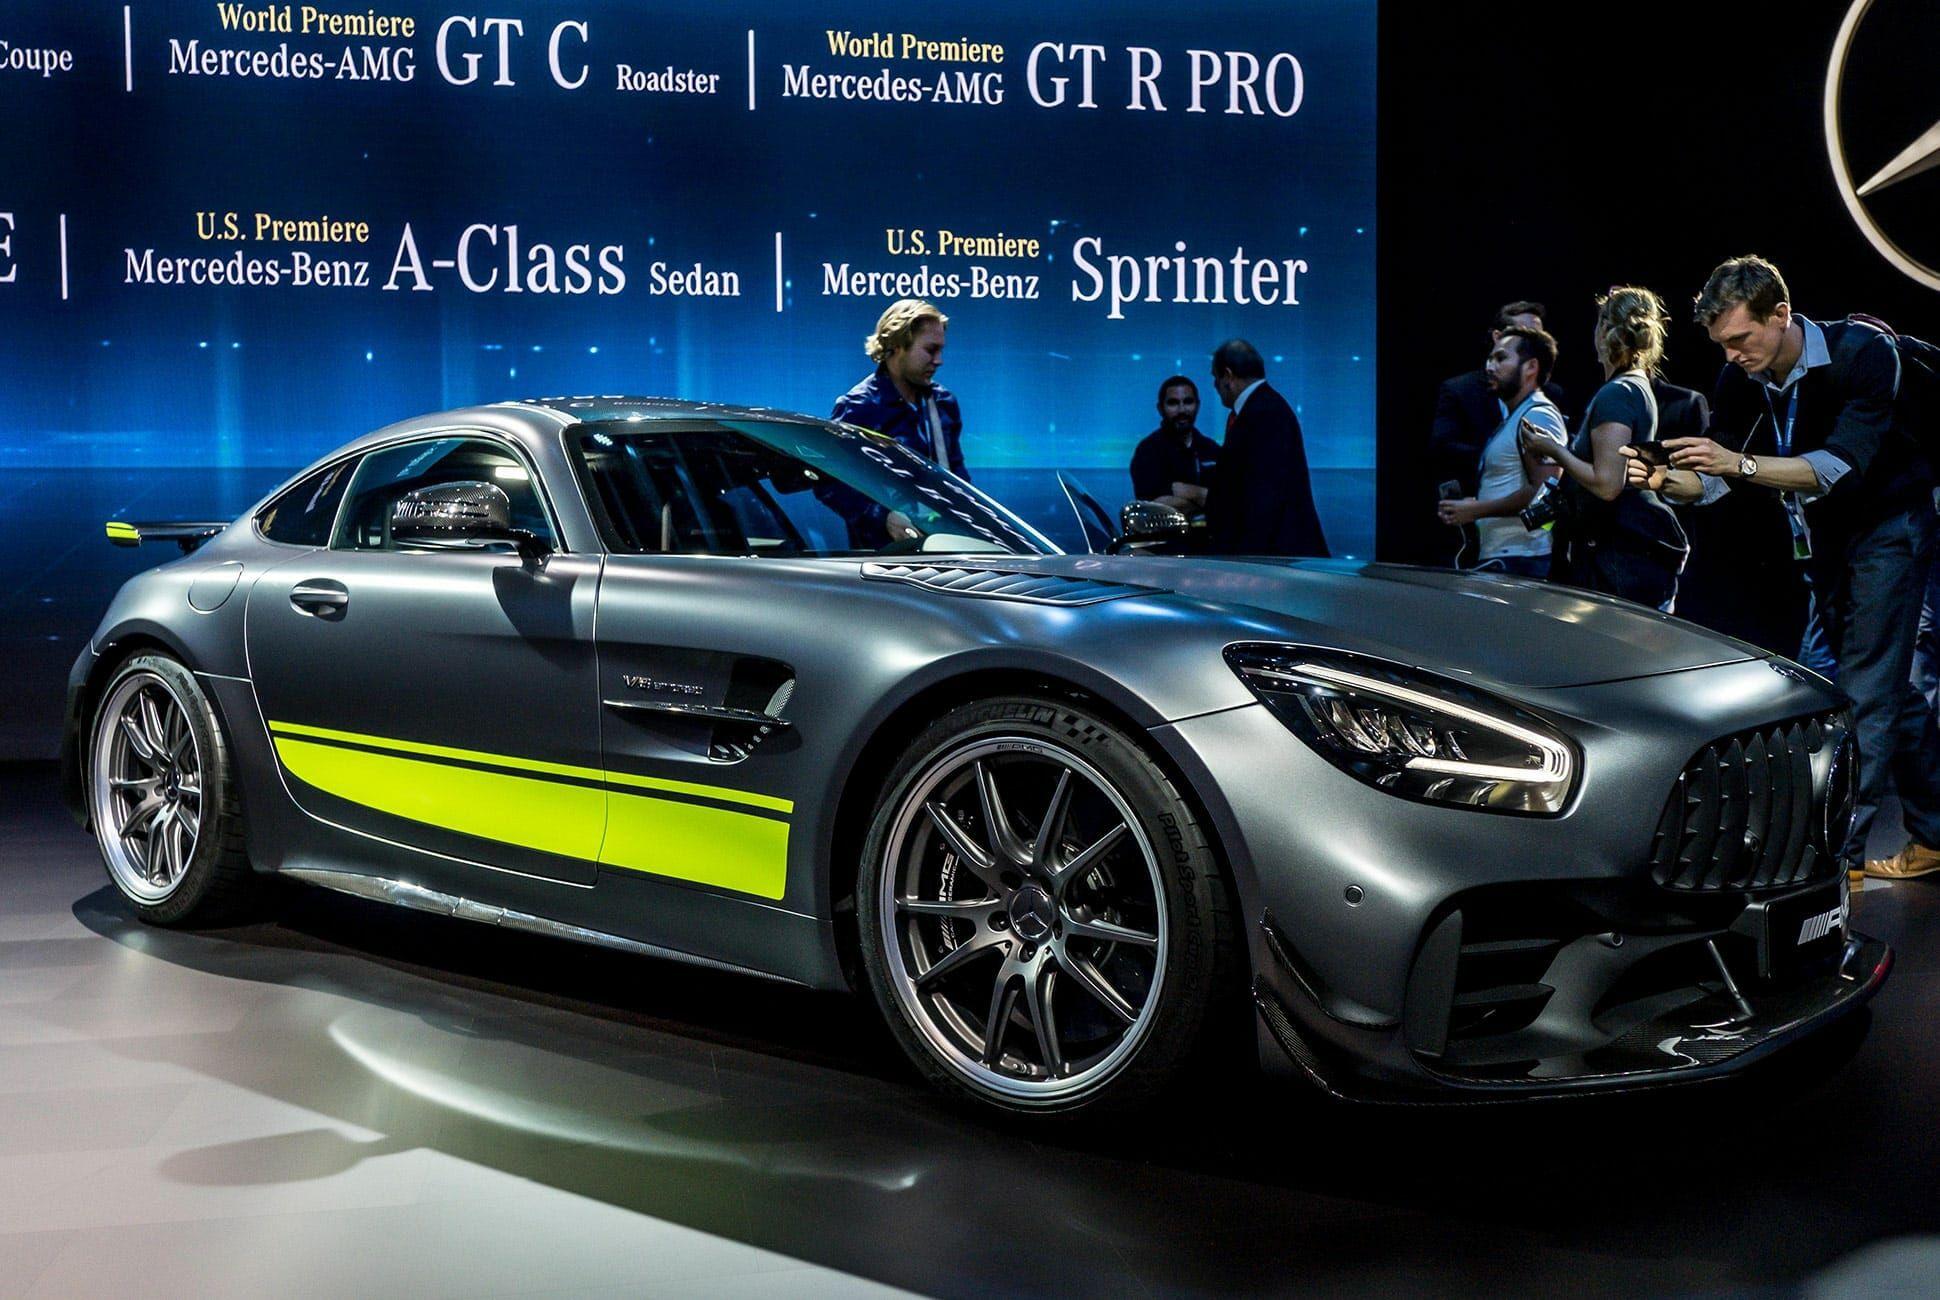 Top-10-LA-Auto-Show-Cars-gear-patrol-AMG-GTR-Pro-slide-1